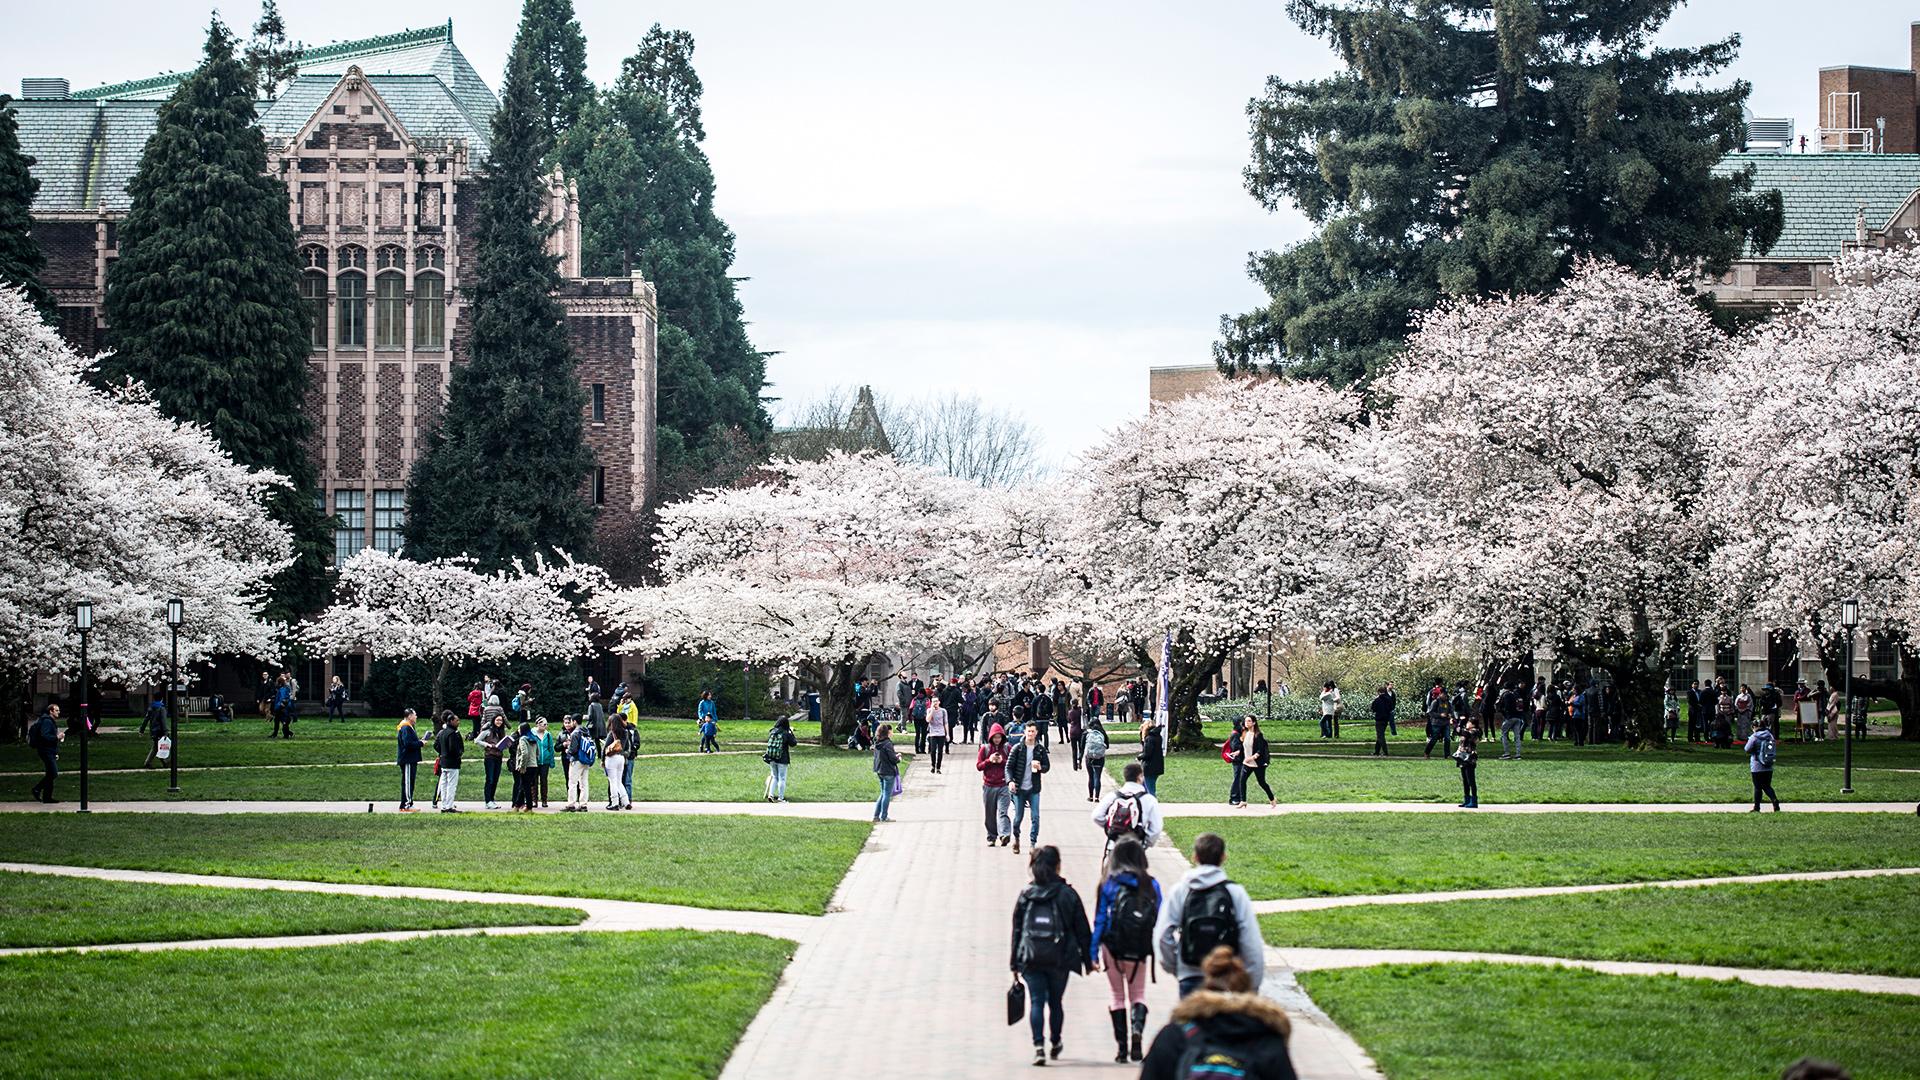 Uw Calendar 2022.University Of Washington Academic Calendar 2021 2022